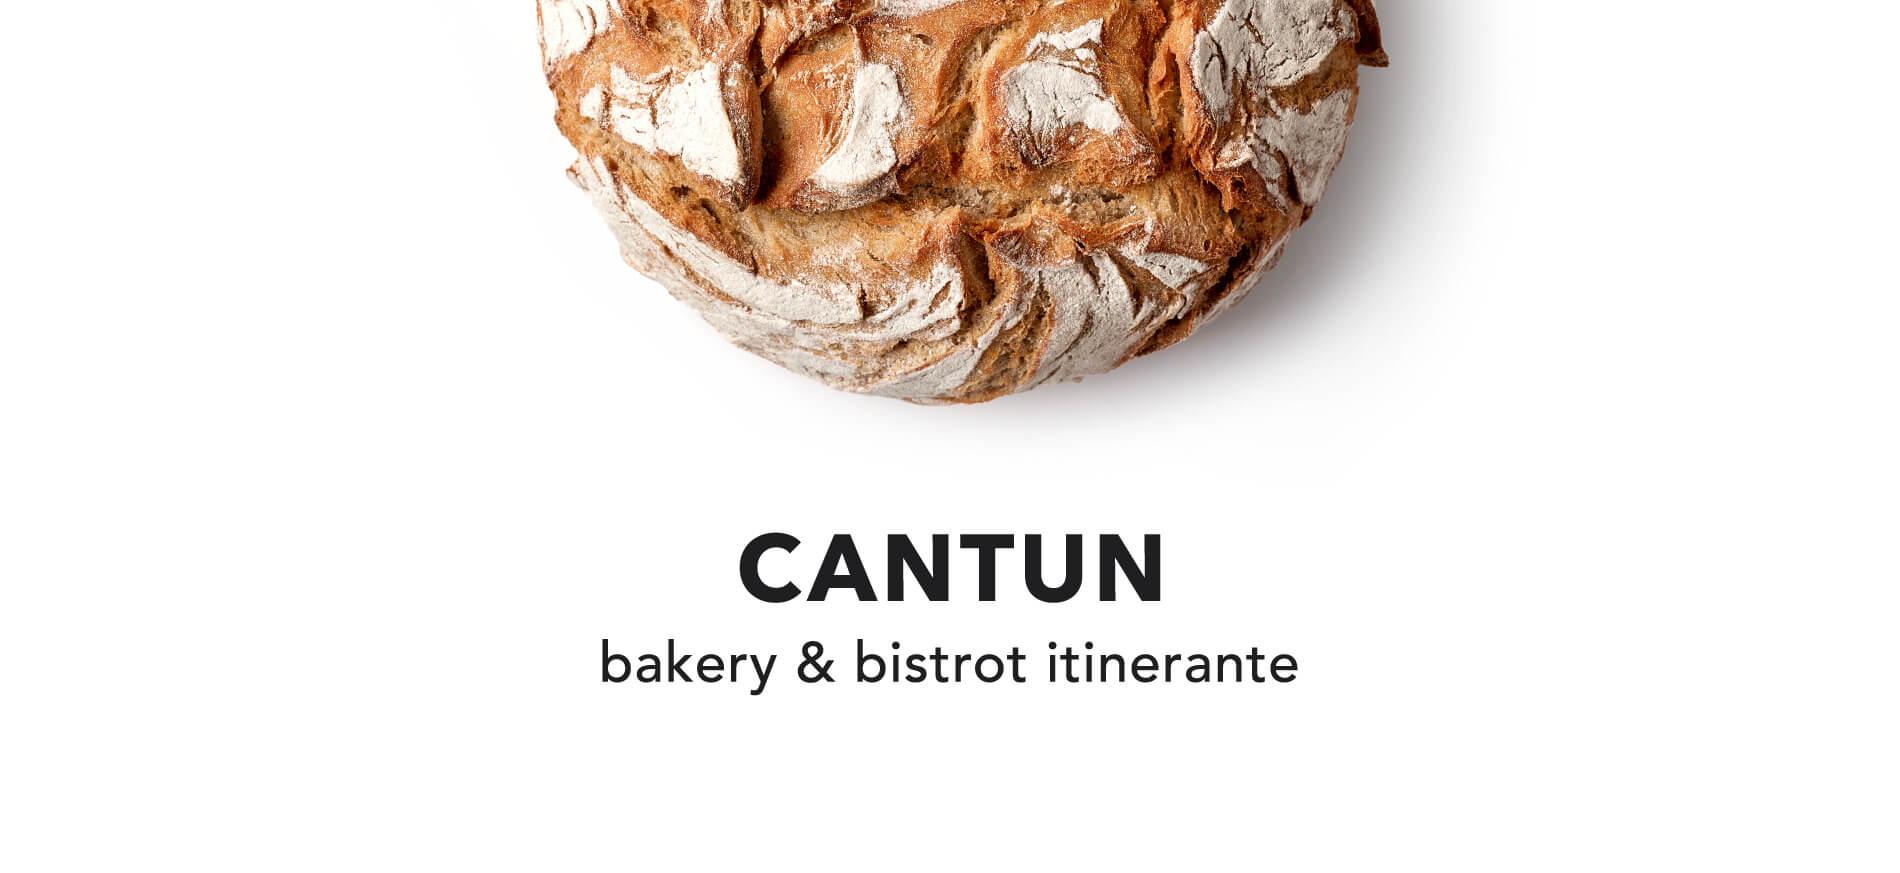 01-Cantun_bakery_bistrot-Logo